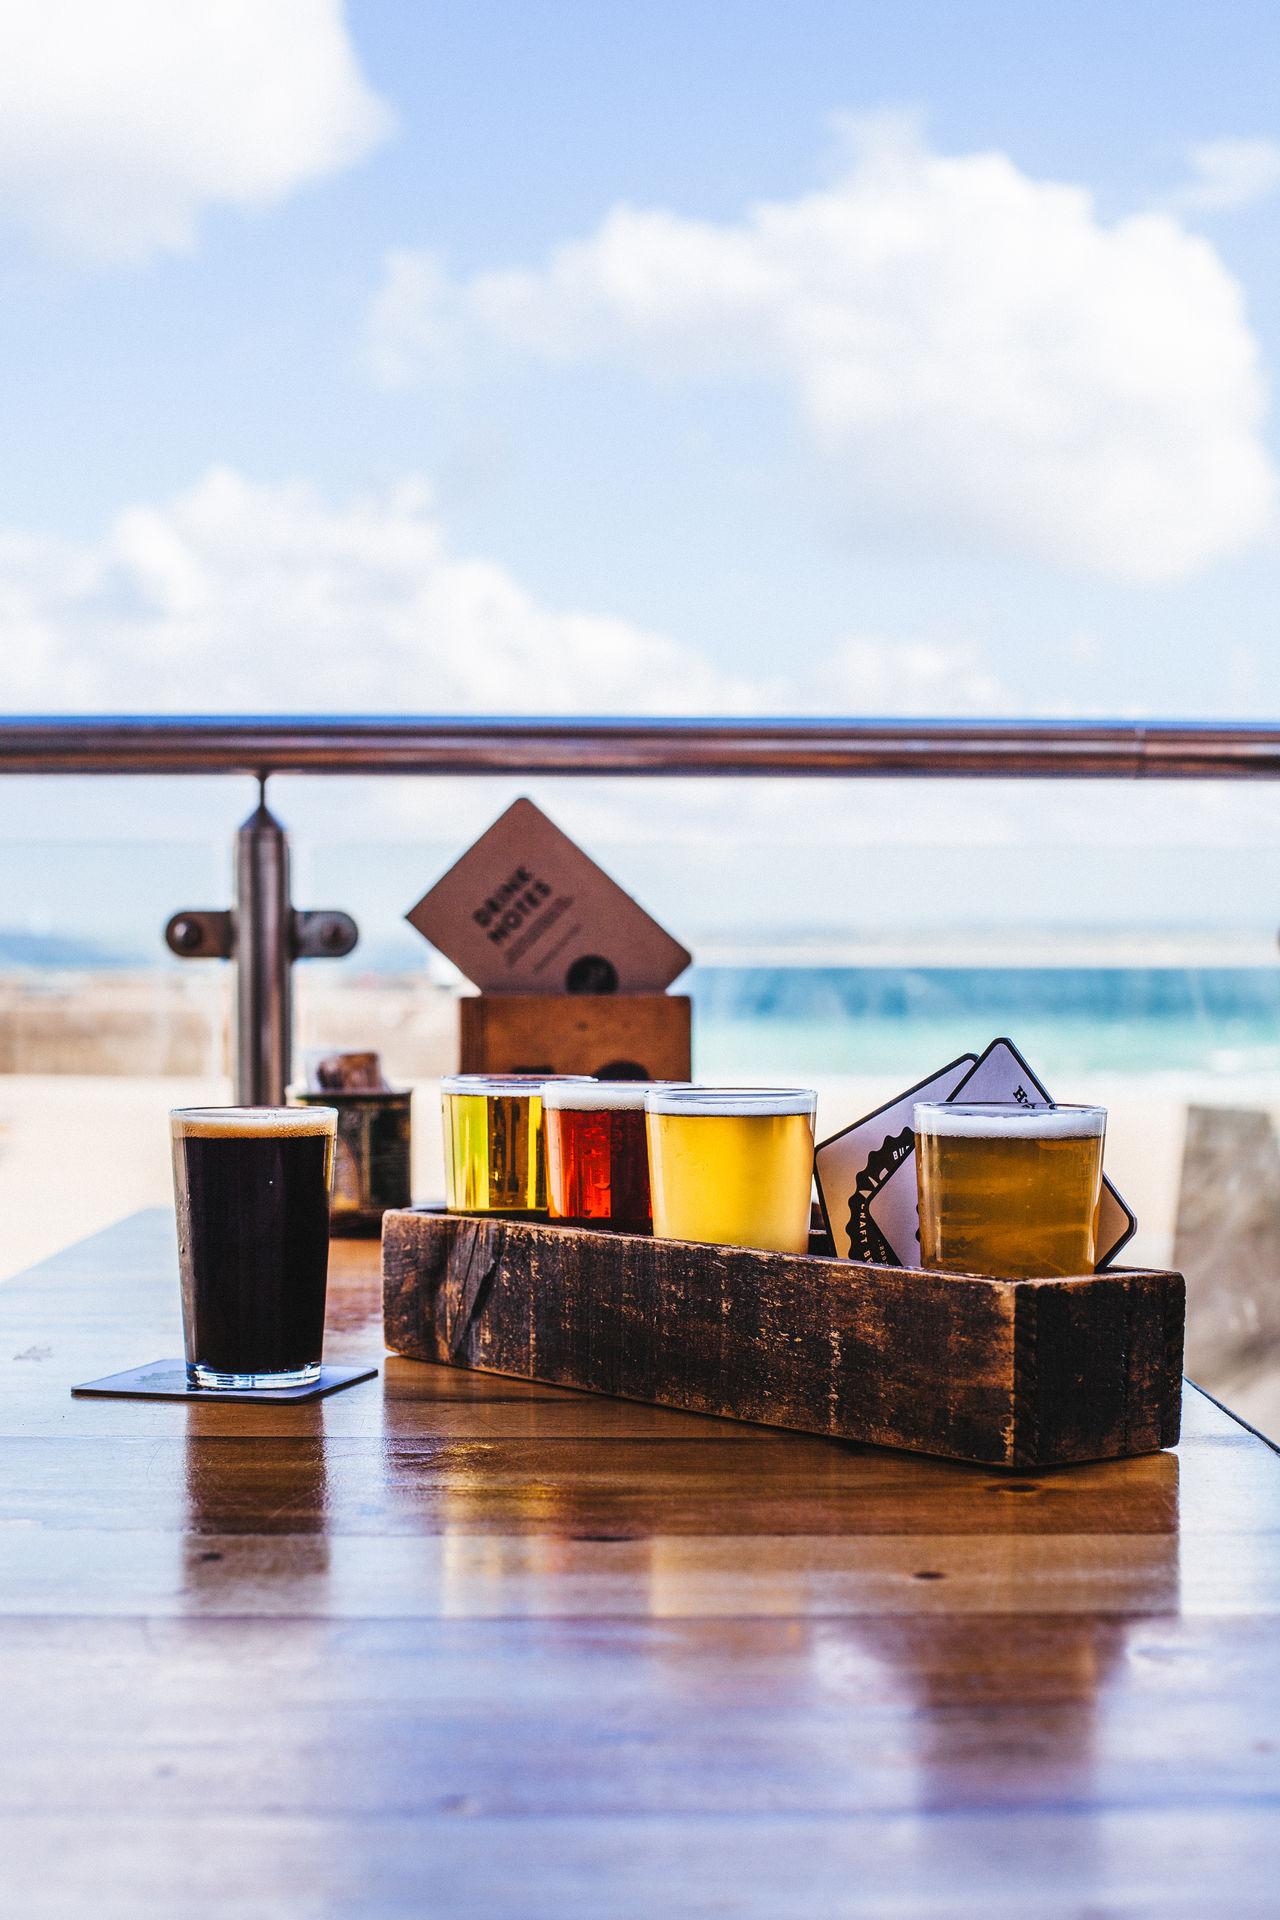 Alcohol Ale Beer Beer Flight Beer Flights Beer Tasting  Beer Time Beers Cable Cloud Cloud - Sky Day Drinks Glass Hobbies IPA Ocean Sea Sky Stout Surface Level Tranquil Scene Tranquility Water Waterfront